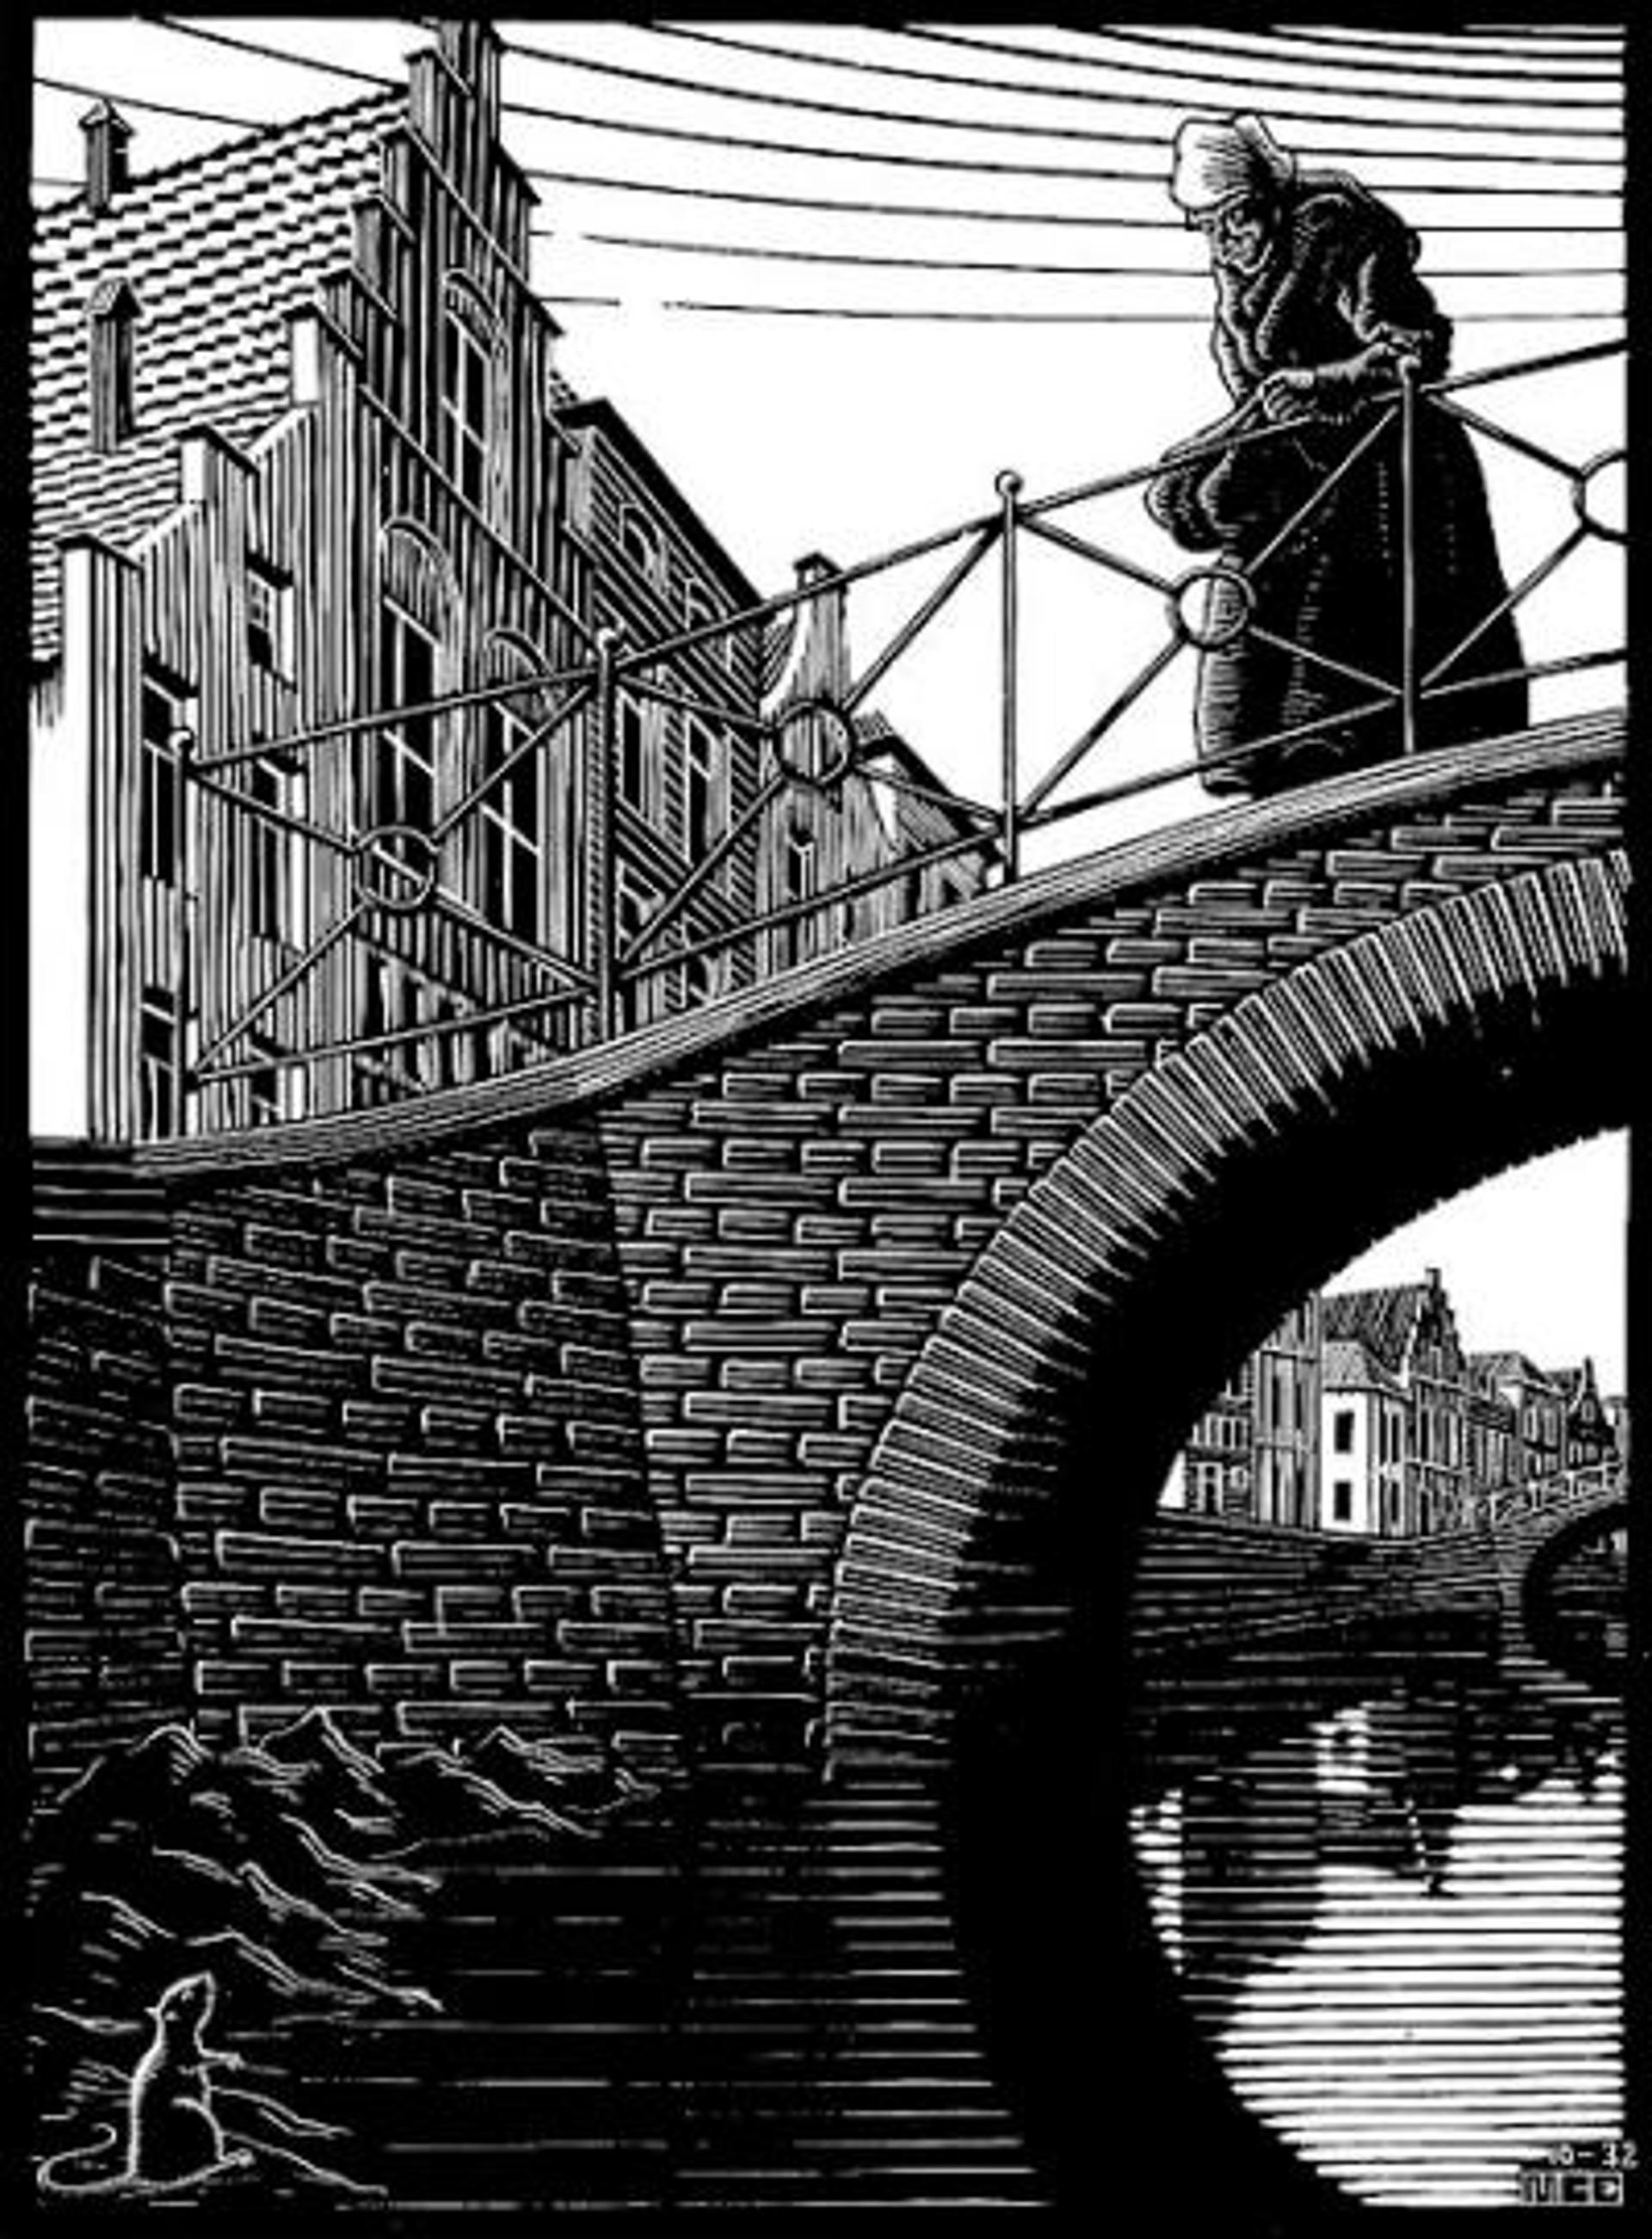 Scholastica (The Bridge) by M.C. Escher